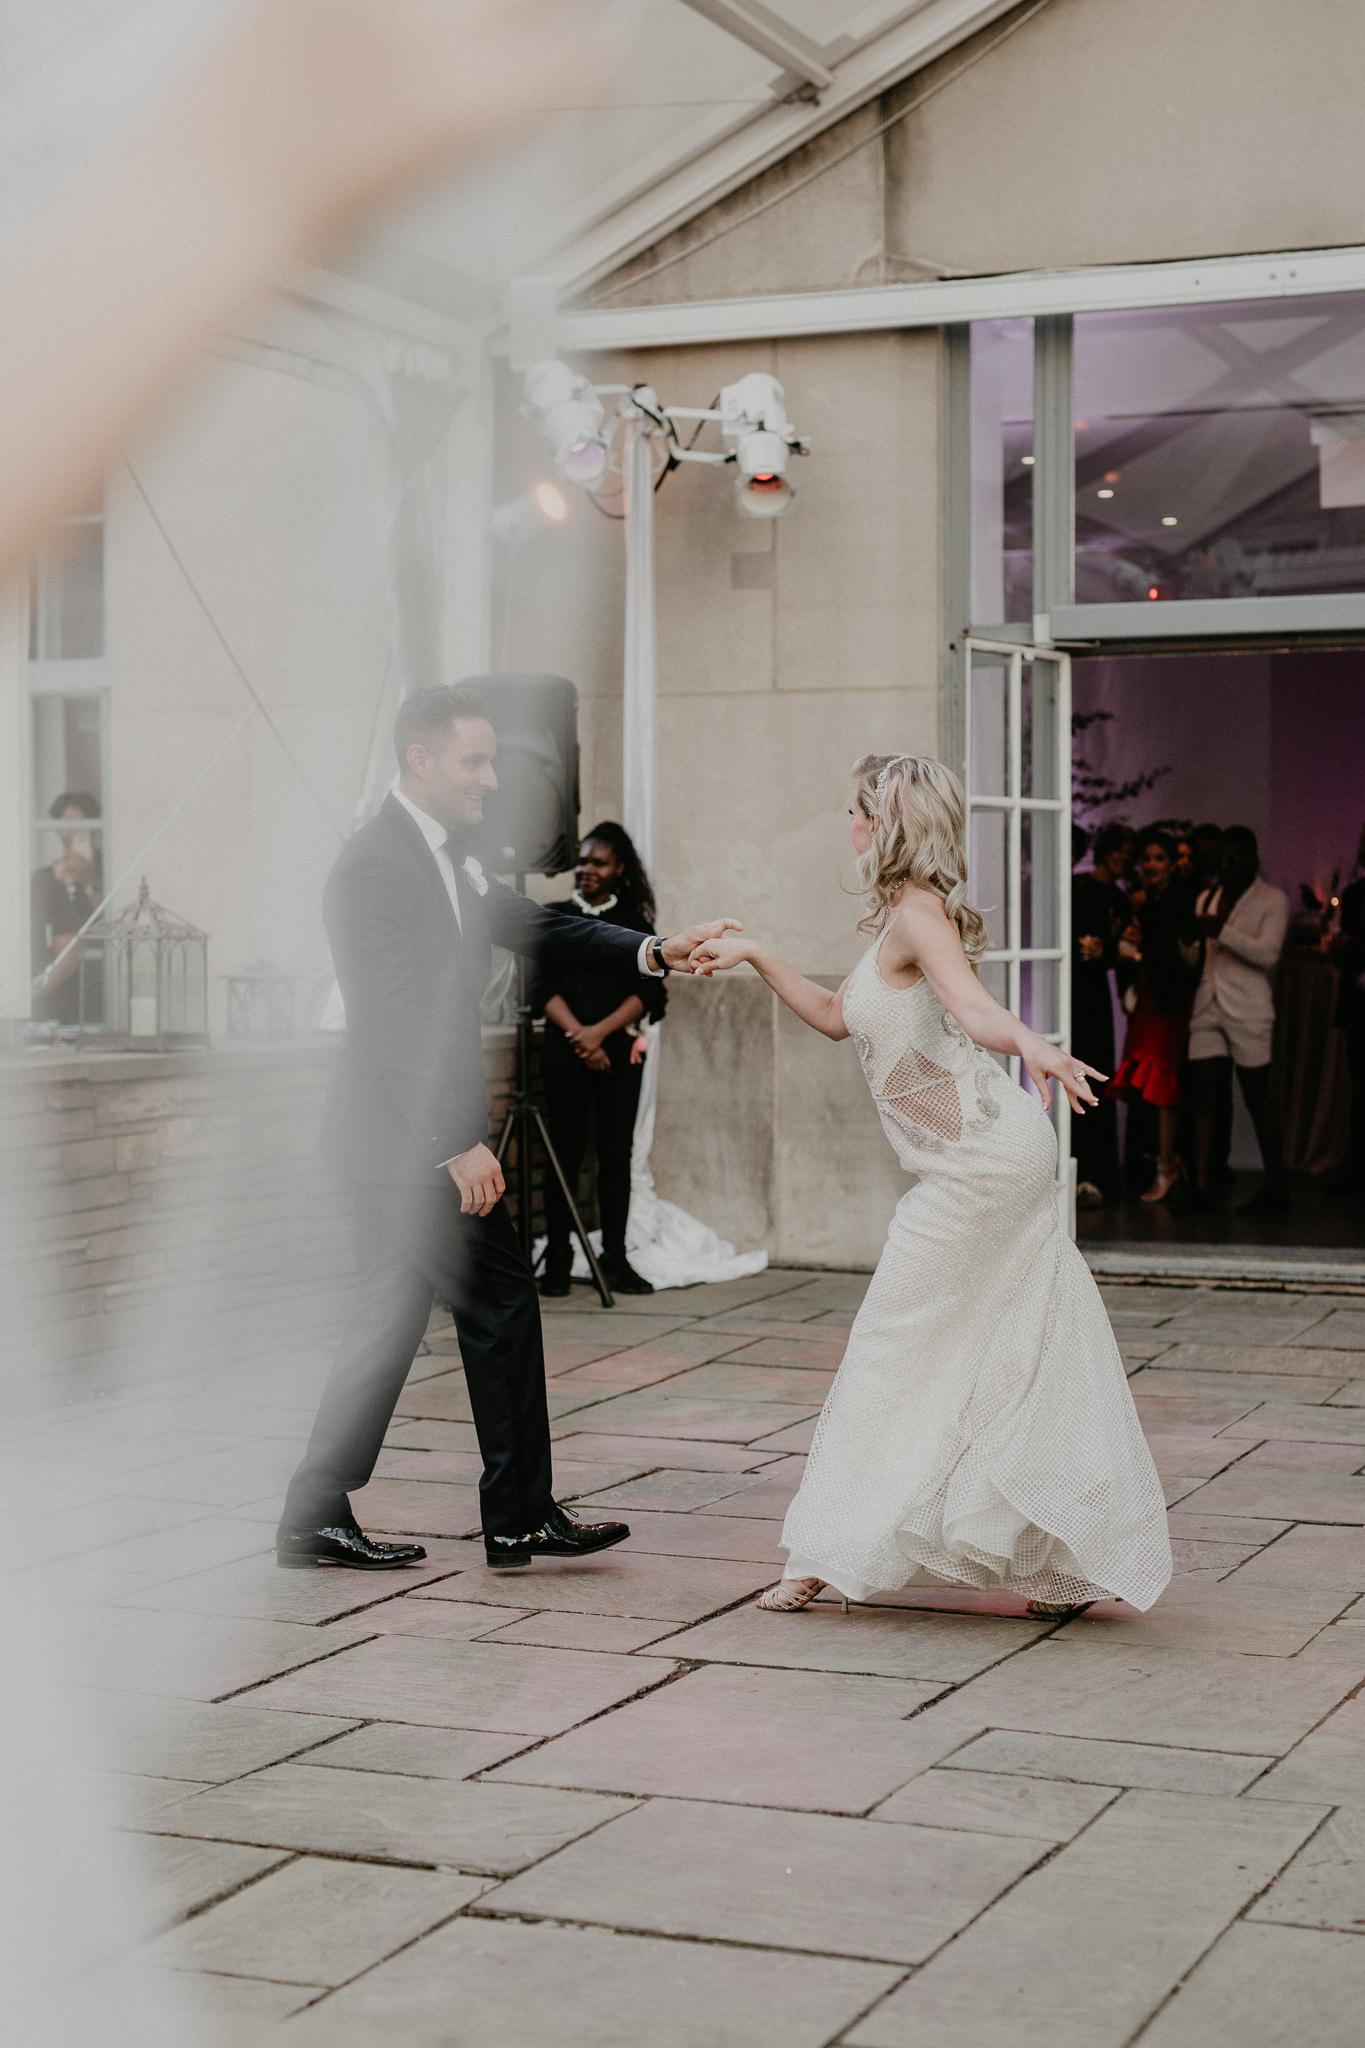 M+J_NYC_Wedding_StPatricks_30Rock_RainbowRoom_101.jpg